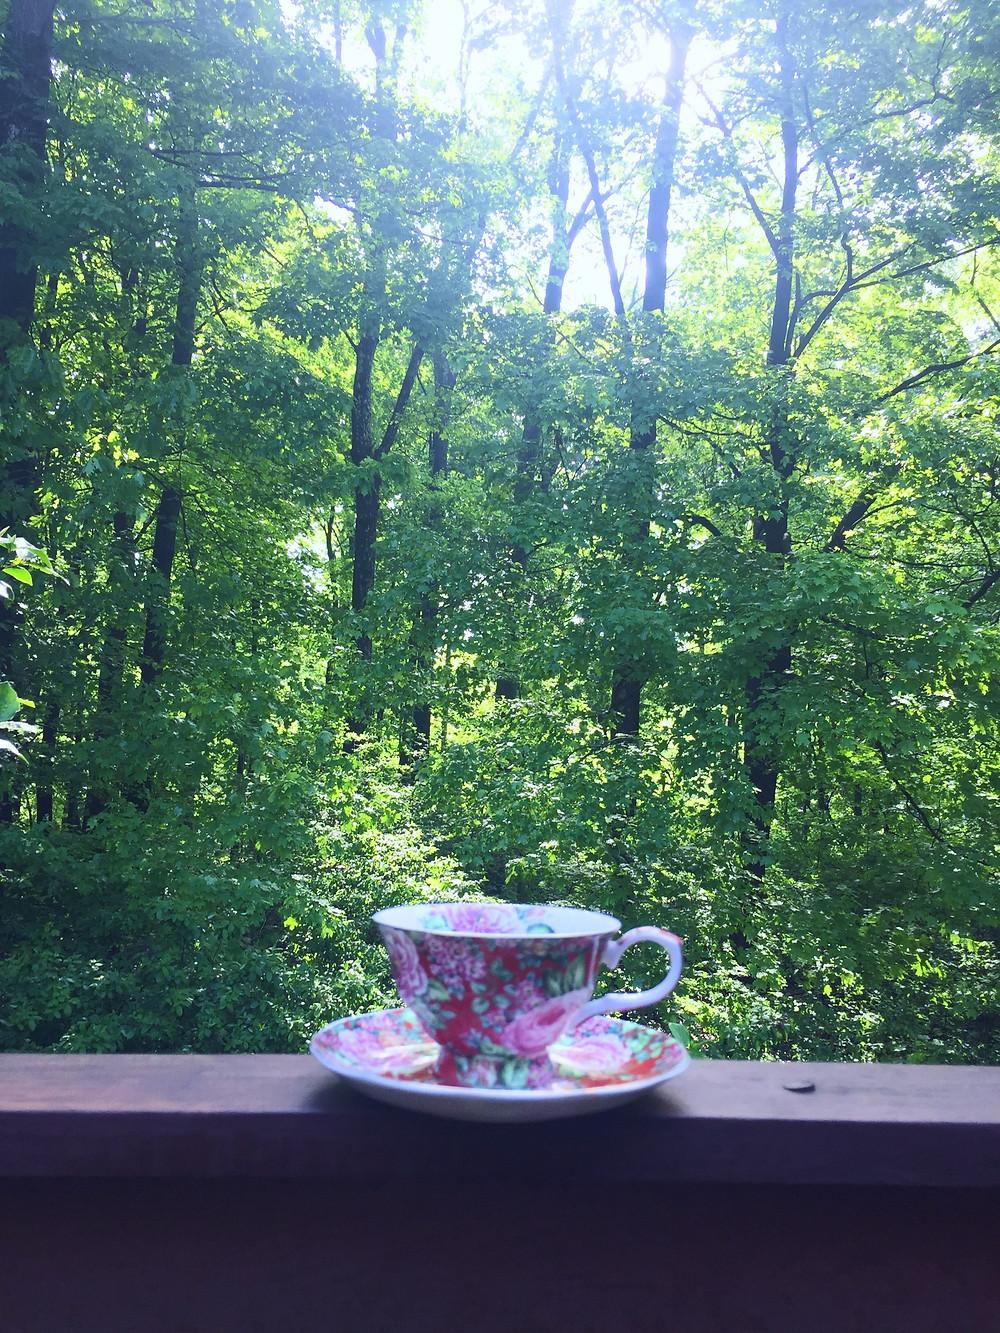 Tea cup and saucer overlooking woods